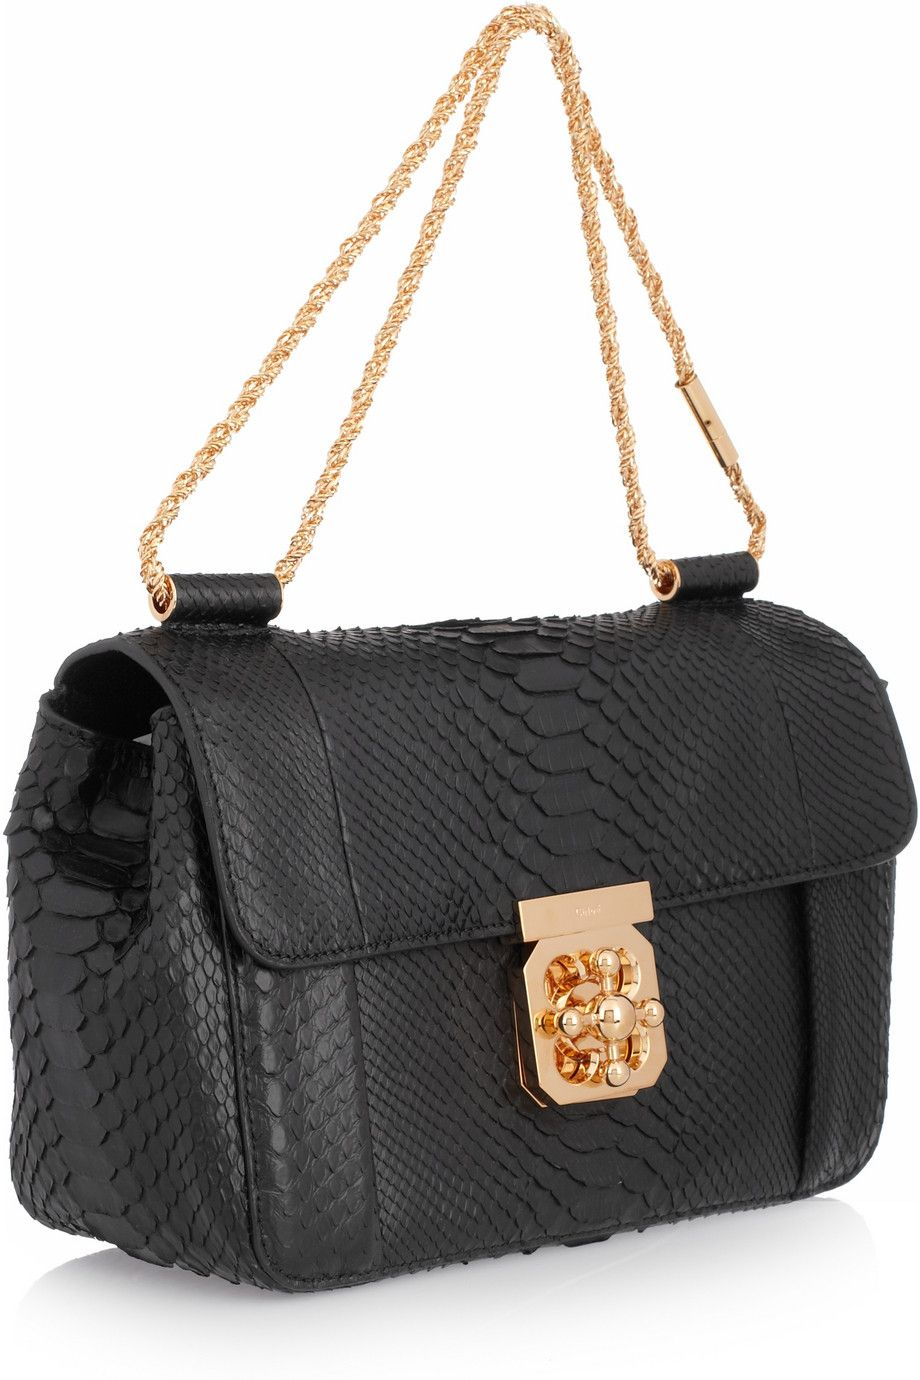 b4e41fe3f0426 Chloé Elsie python shoulder bag. Compact and chic, Chloé's black python ' Elsie'